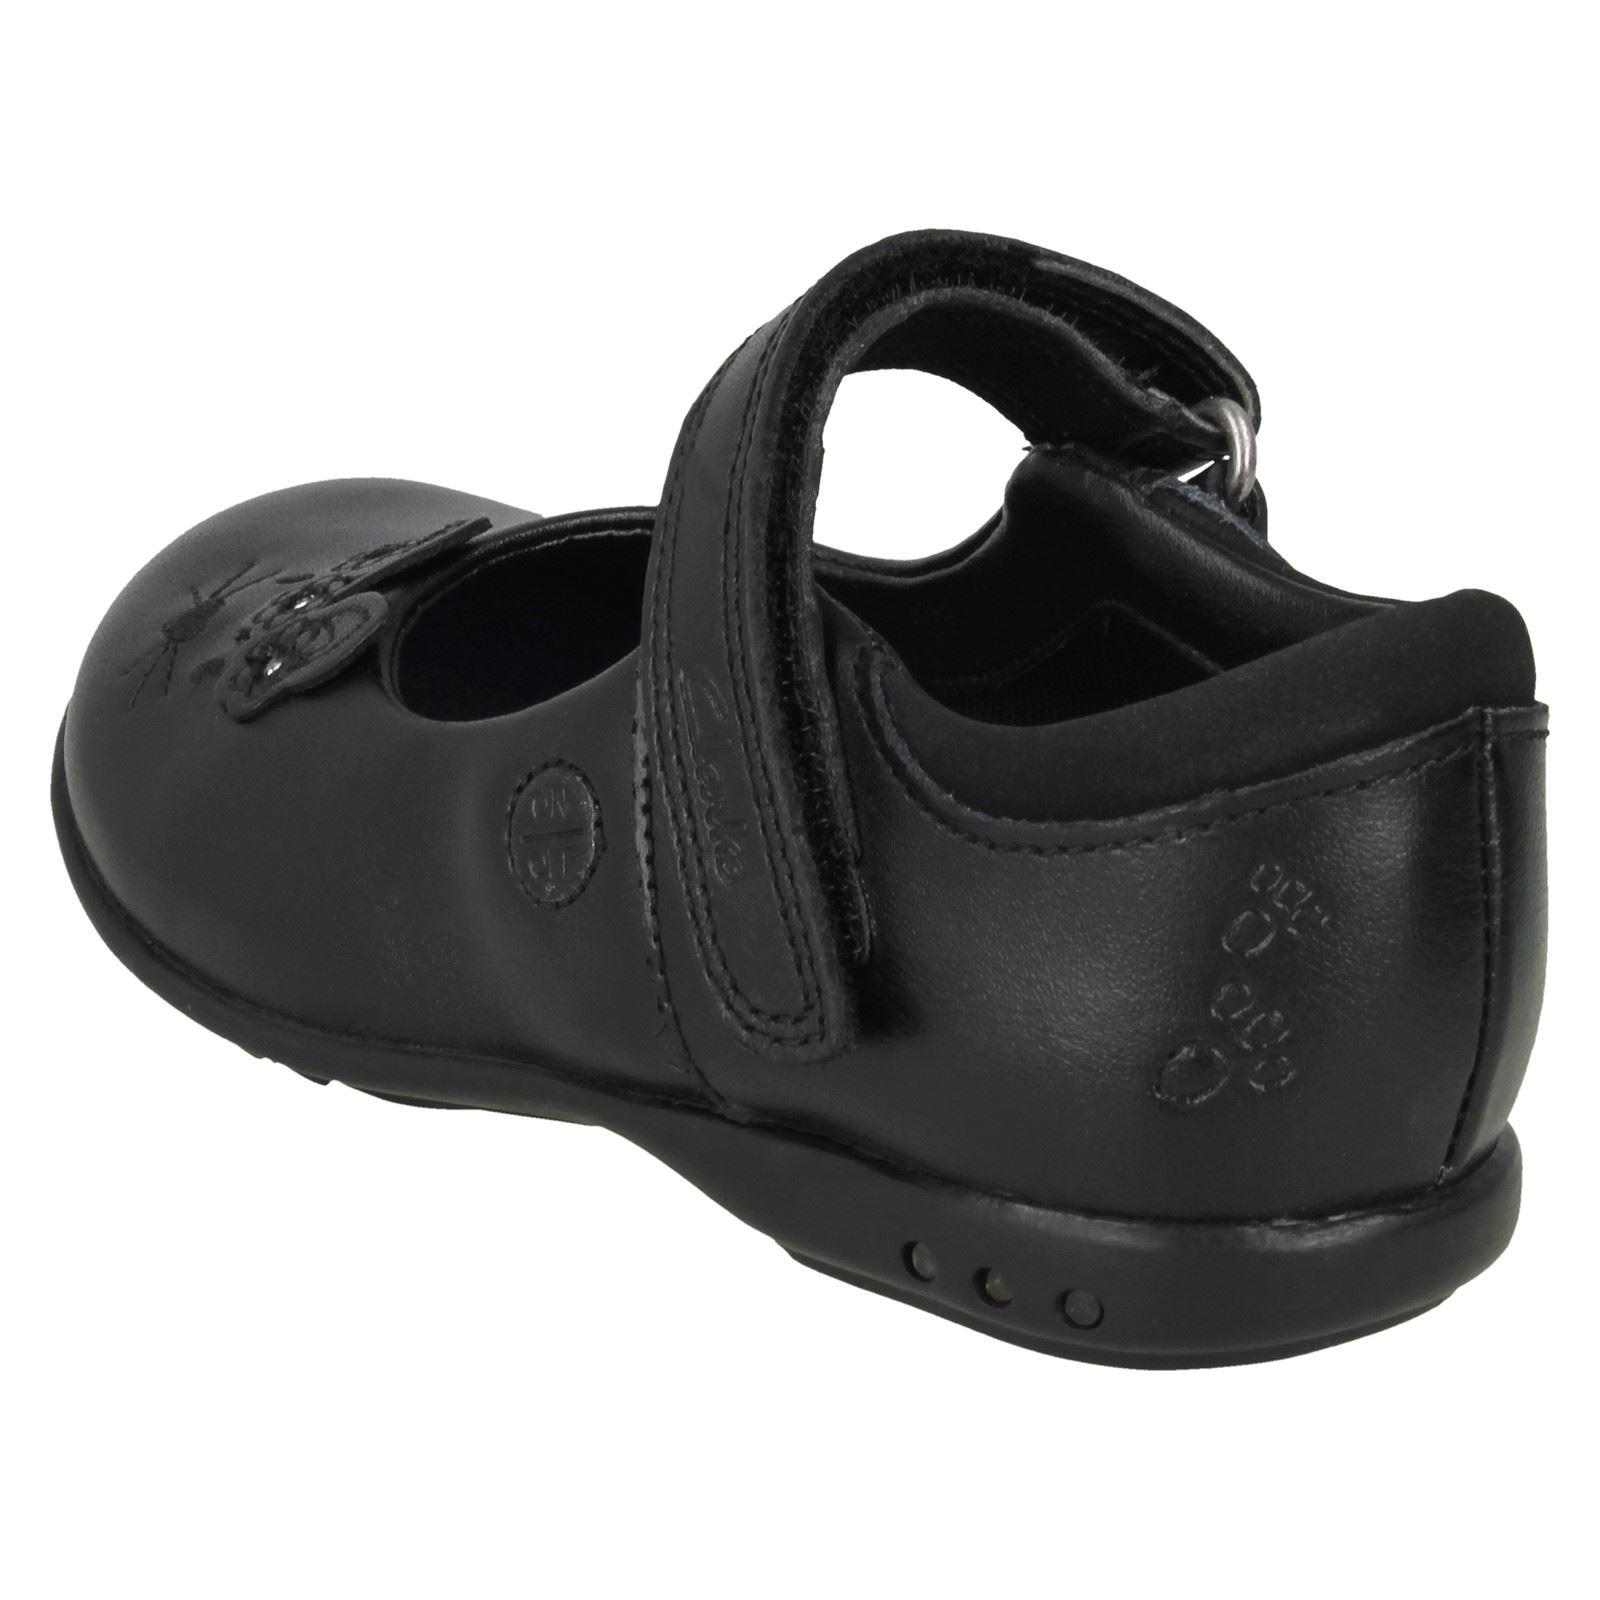 Girls Clarks Hook /& Loop School Shoes with Lights Trixi Run